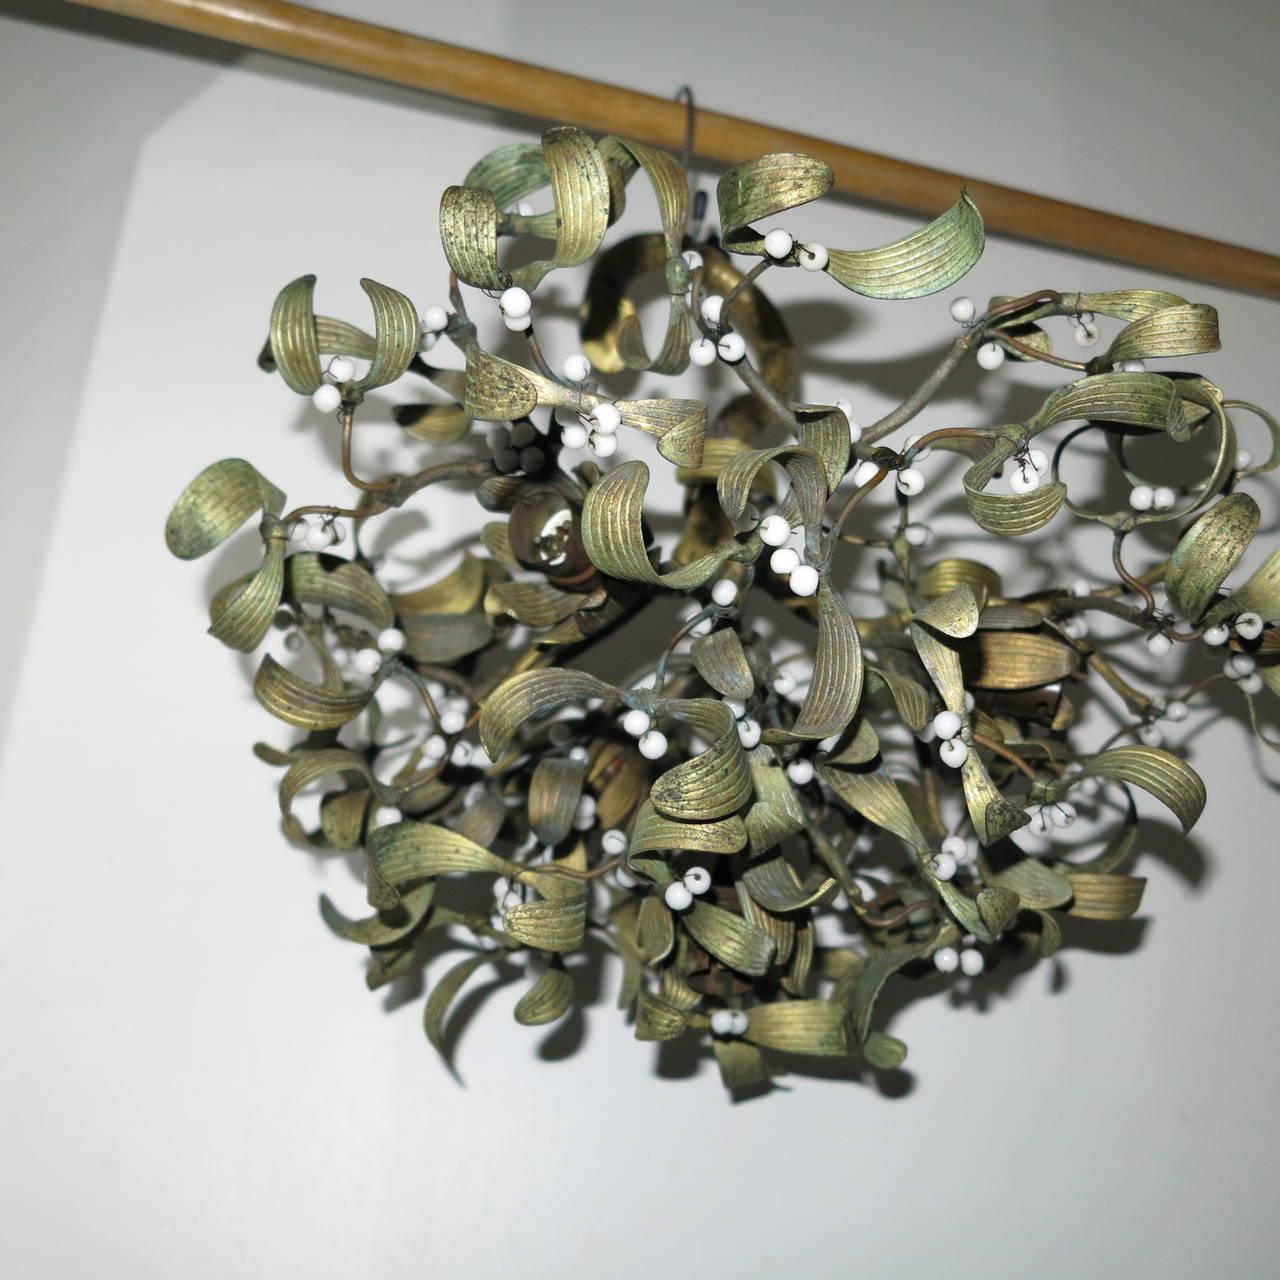 Polish Ball of Mistletoe Art Nouveau Bronze with Four Bulbs and Pearls Opaline 5